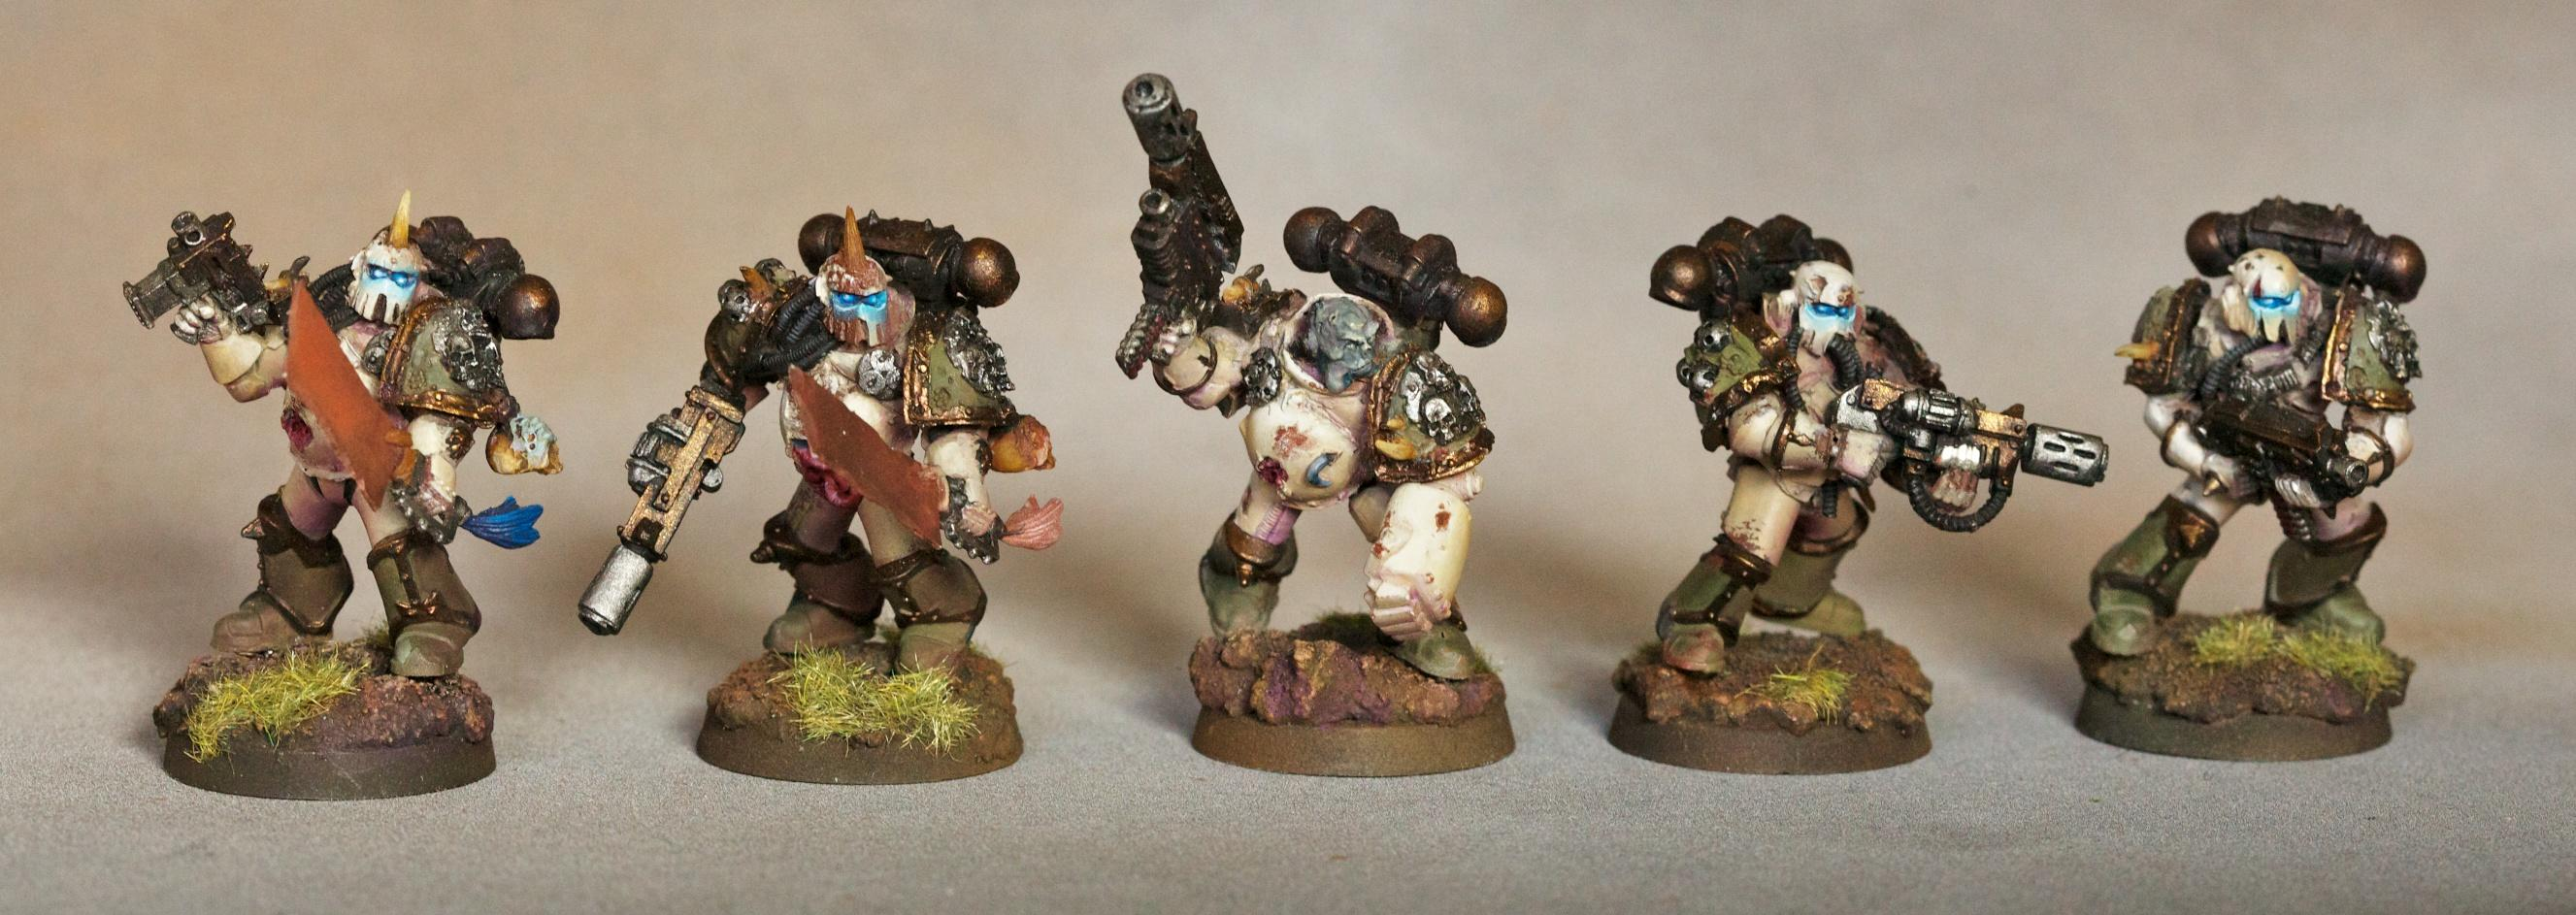 Death Gaurd, Nurgle, Plague